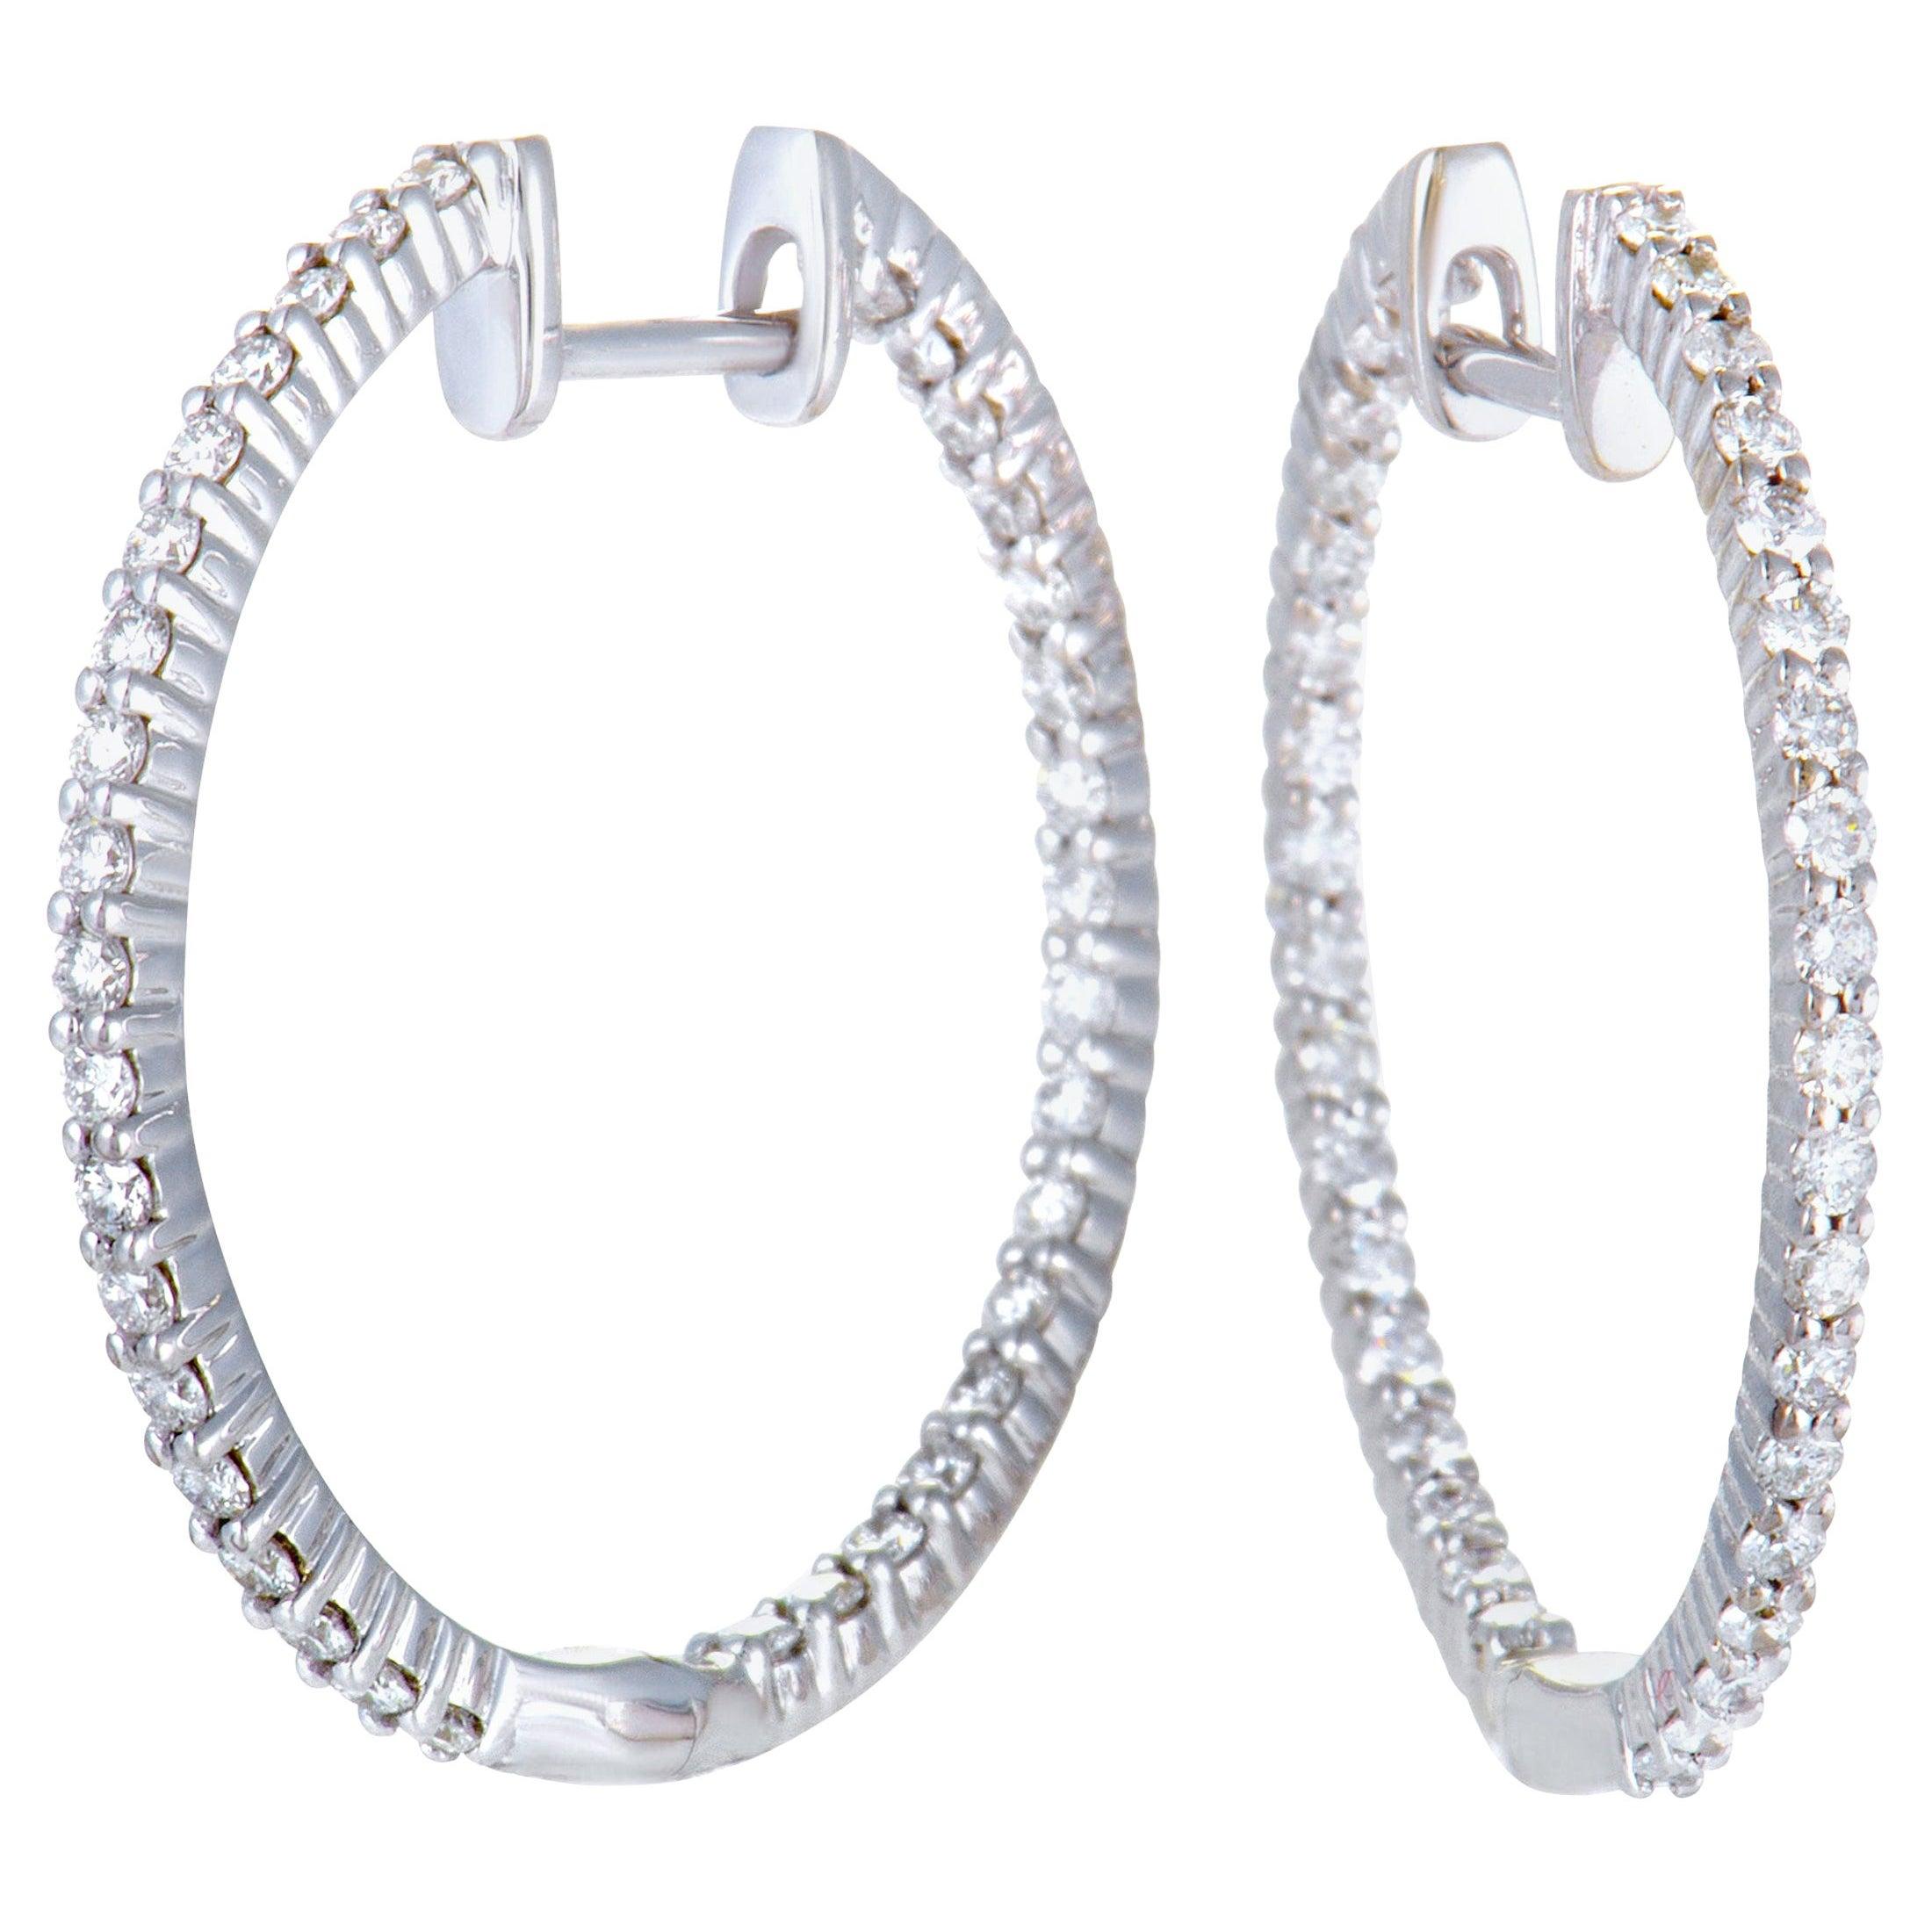 LB Exclusive White Gold 1.00 Carat VS1 G Color Diamond Pave Hoop Earrings